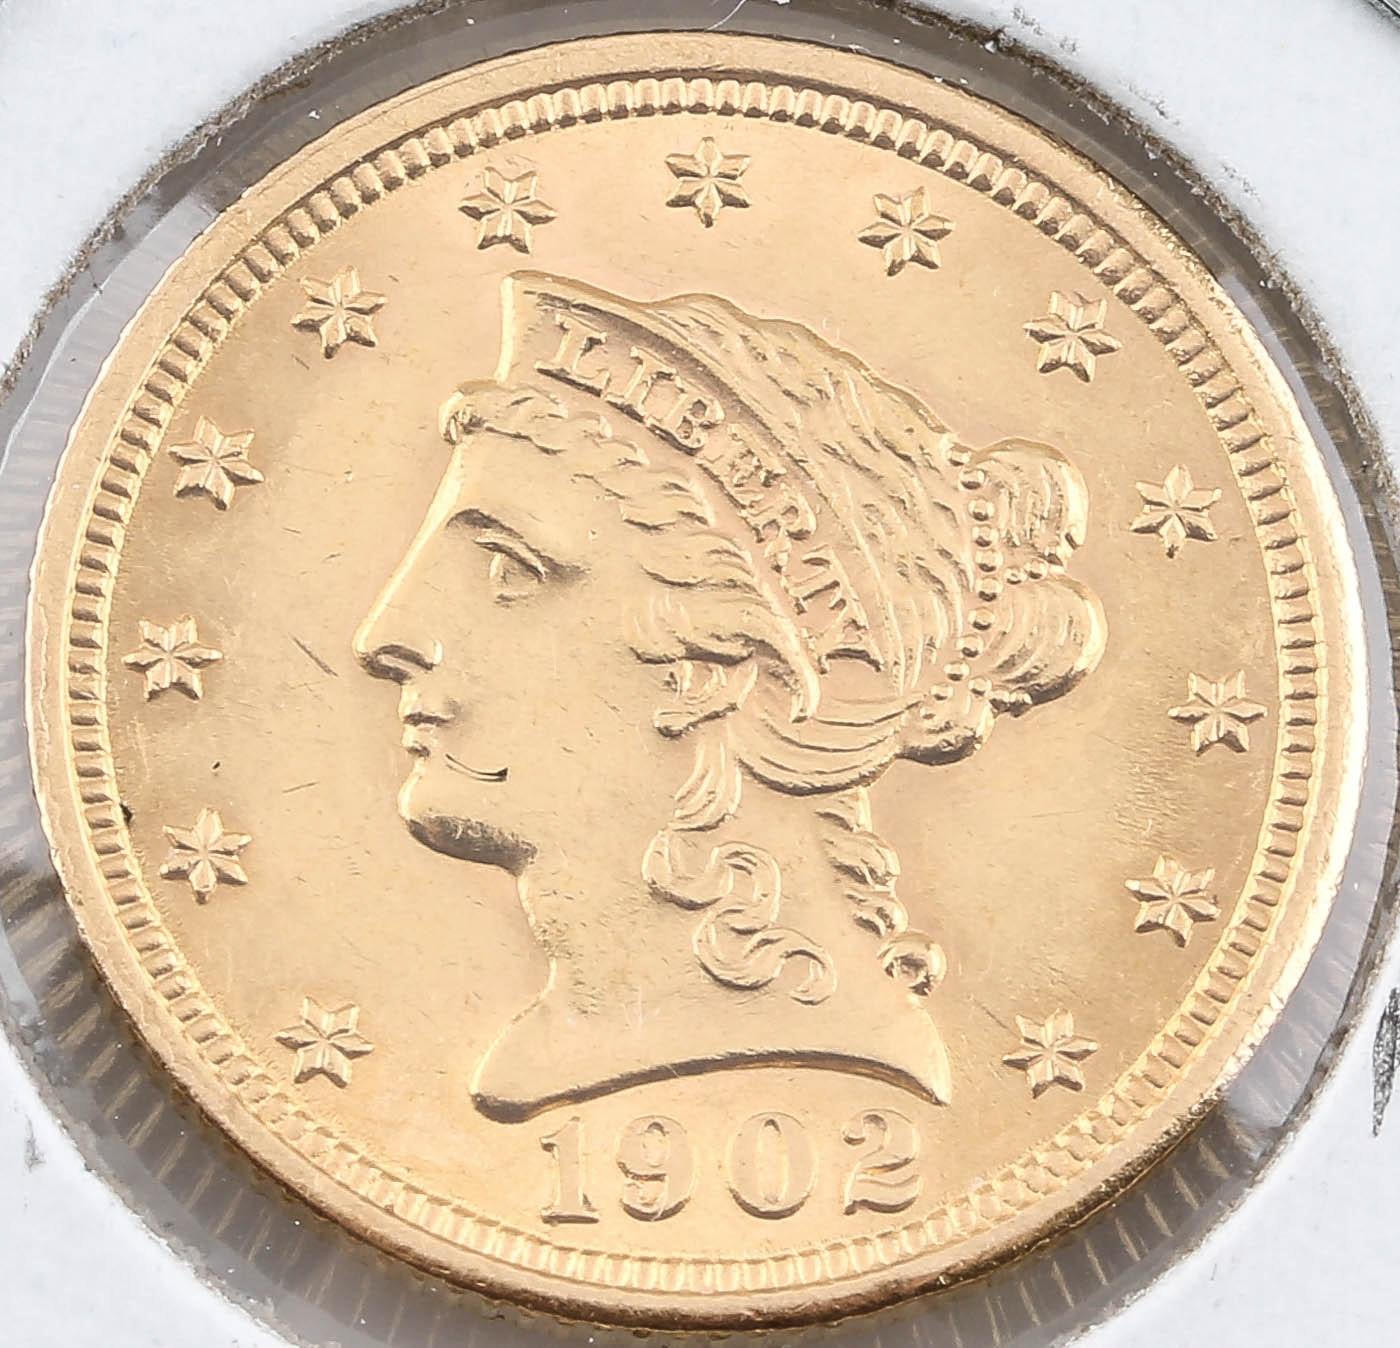 1902 Liberty Head $2 1/2 Gold Coin